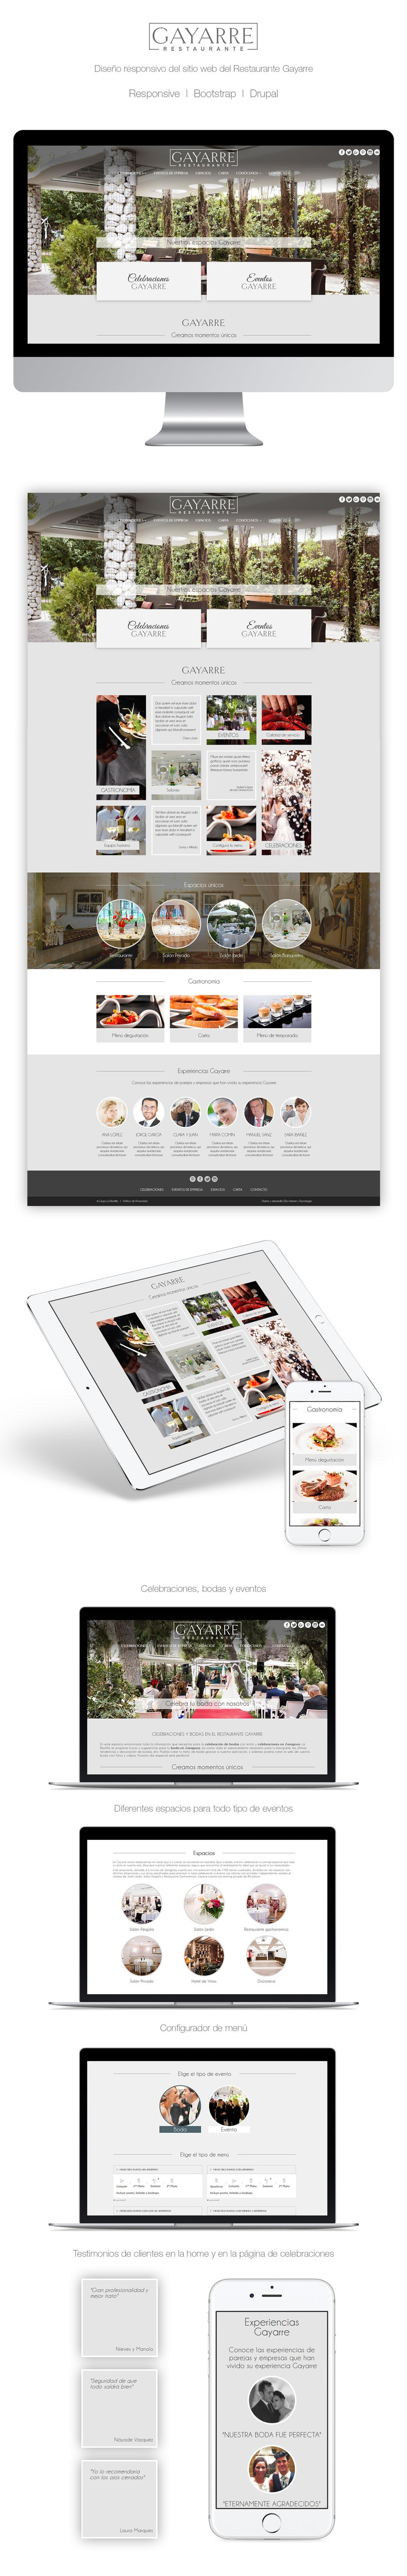 Restaurante Gayarre | Website -1